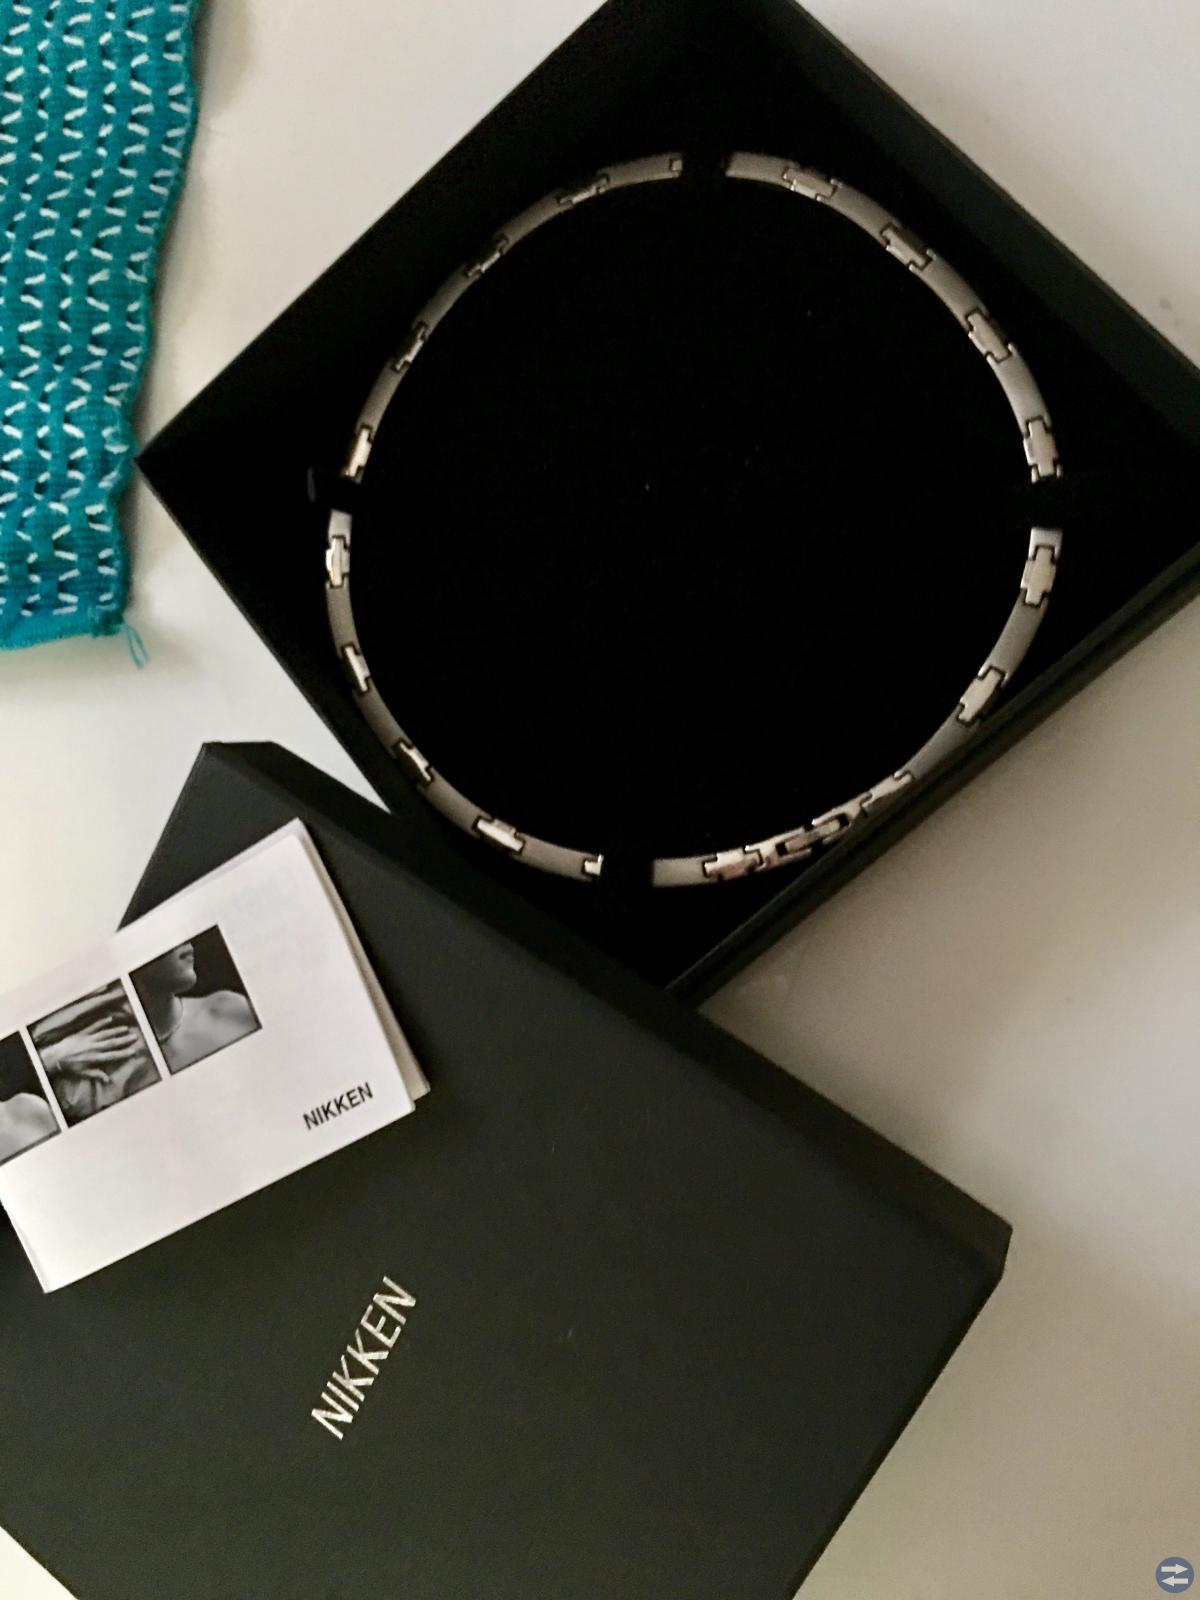 Nikken halsband(värk)Marc Jacobs.nordic light.sago